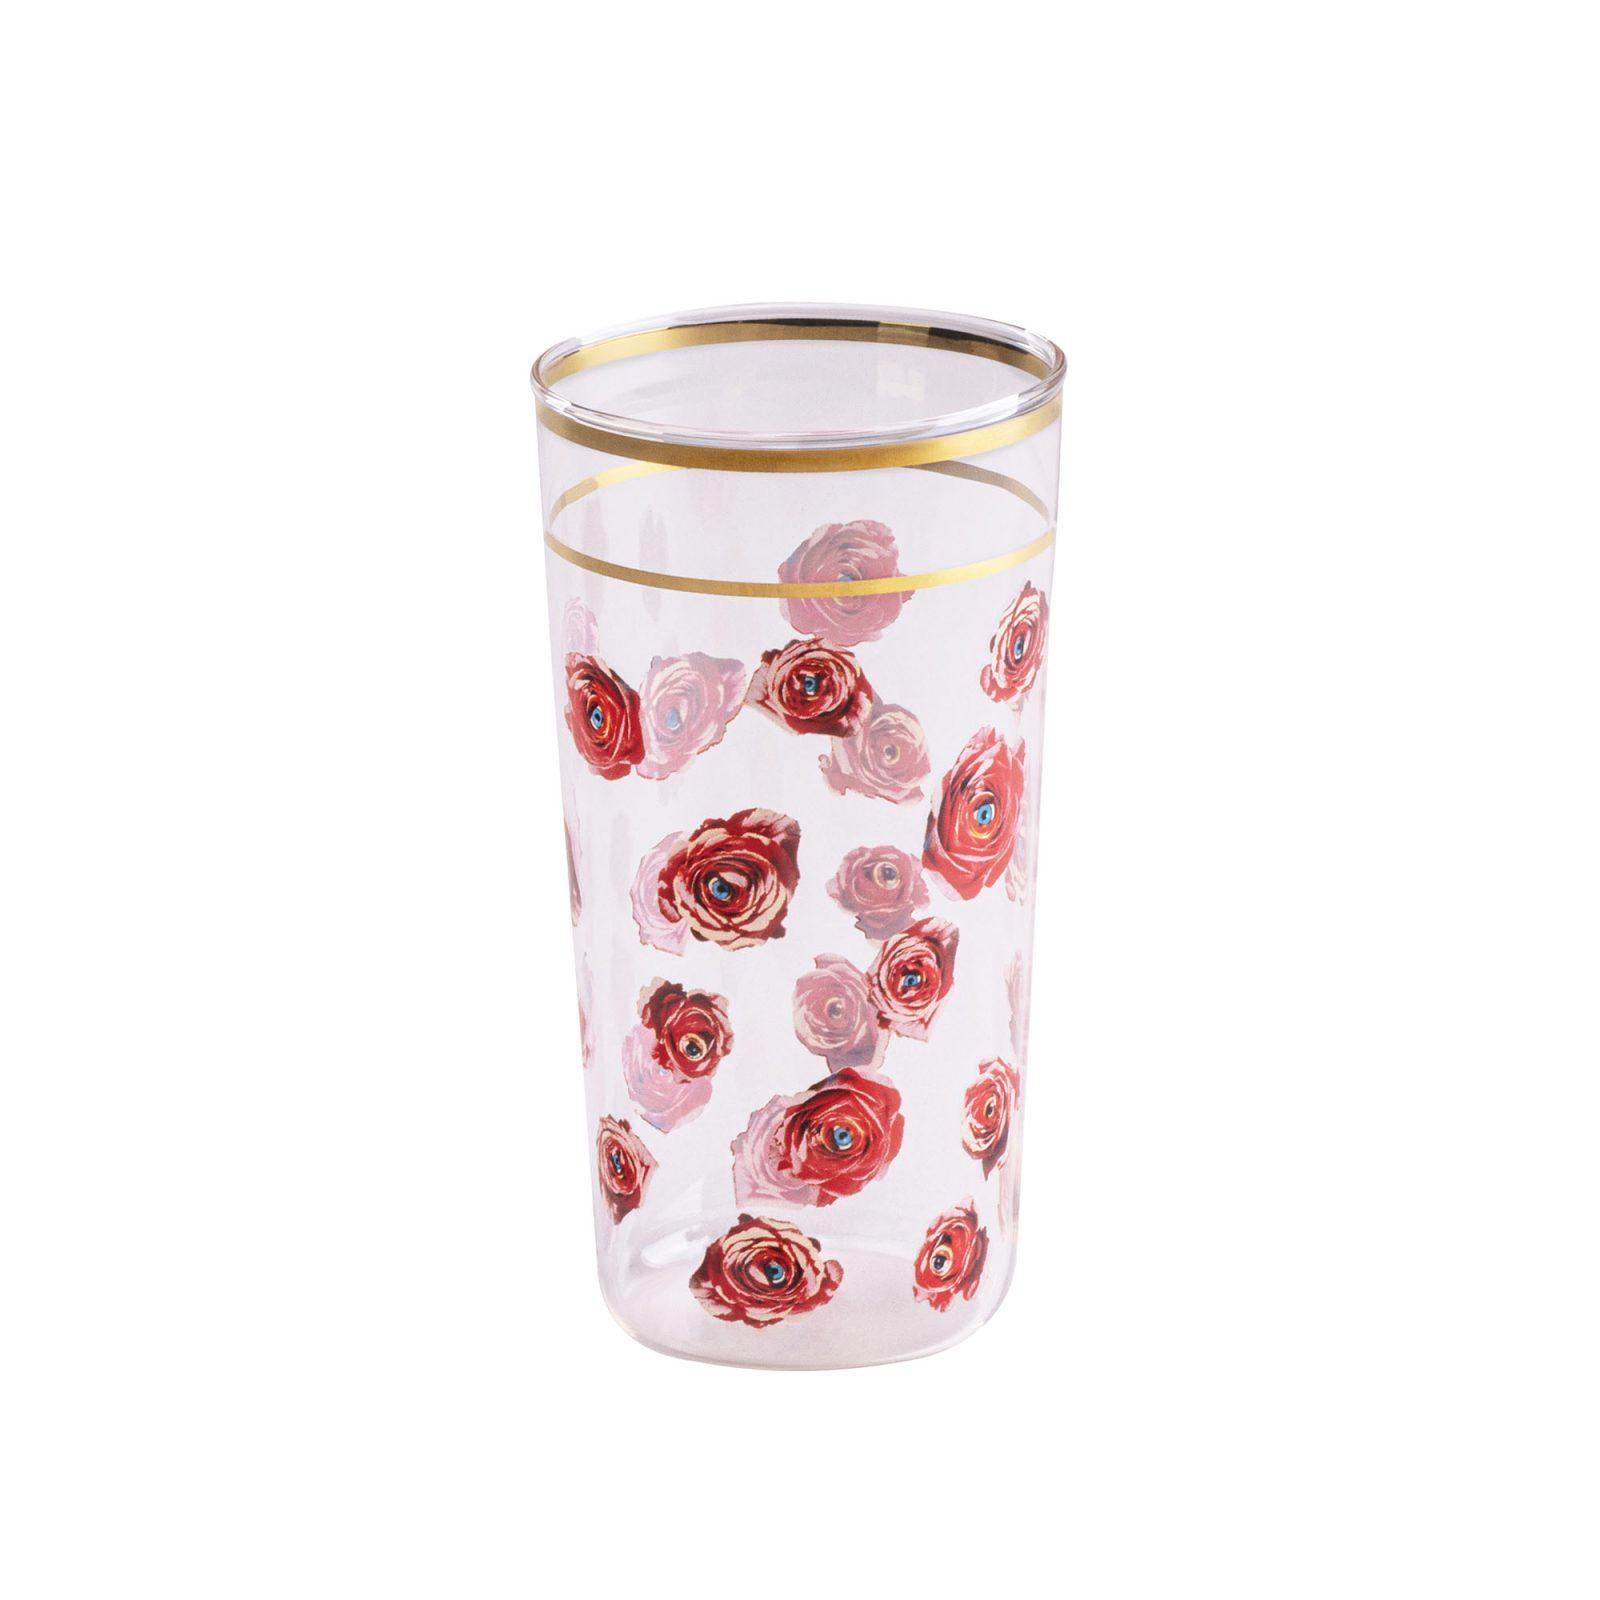 seletti-toiletpaper-driking-glasses-roses-2